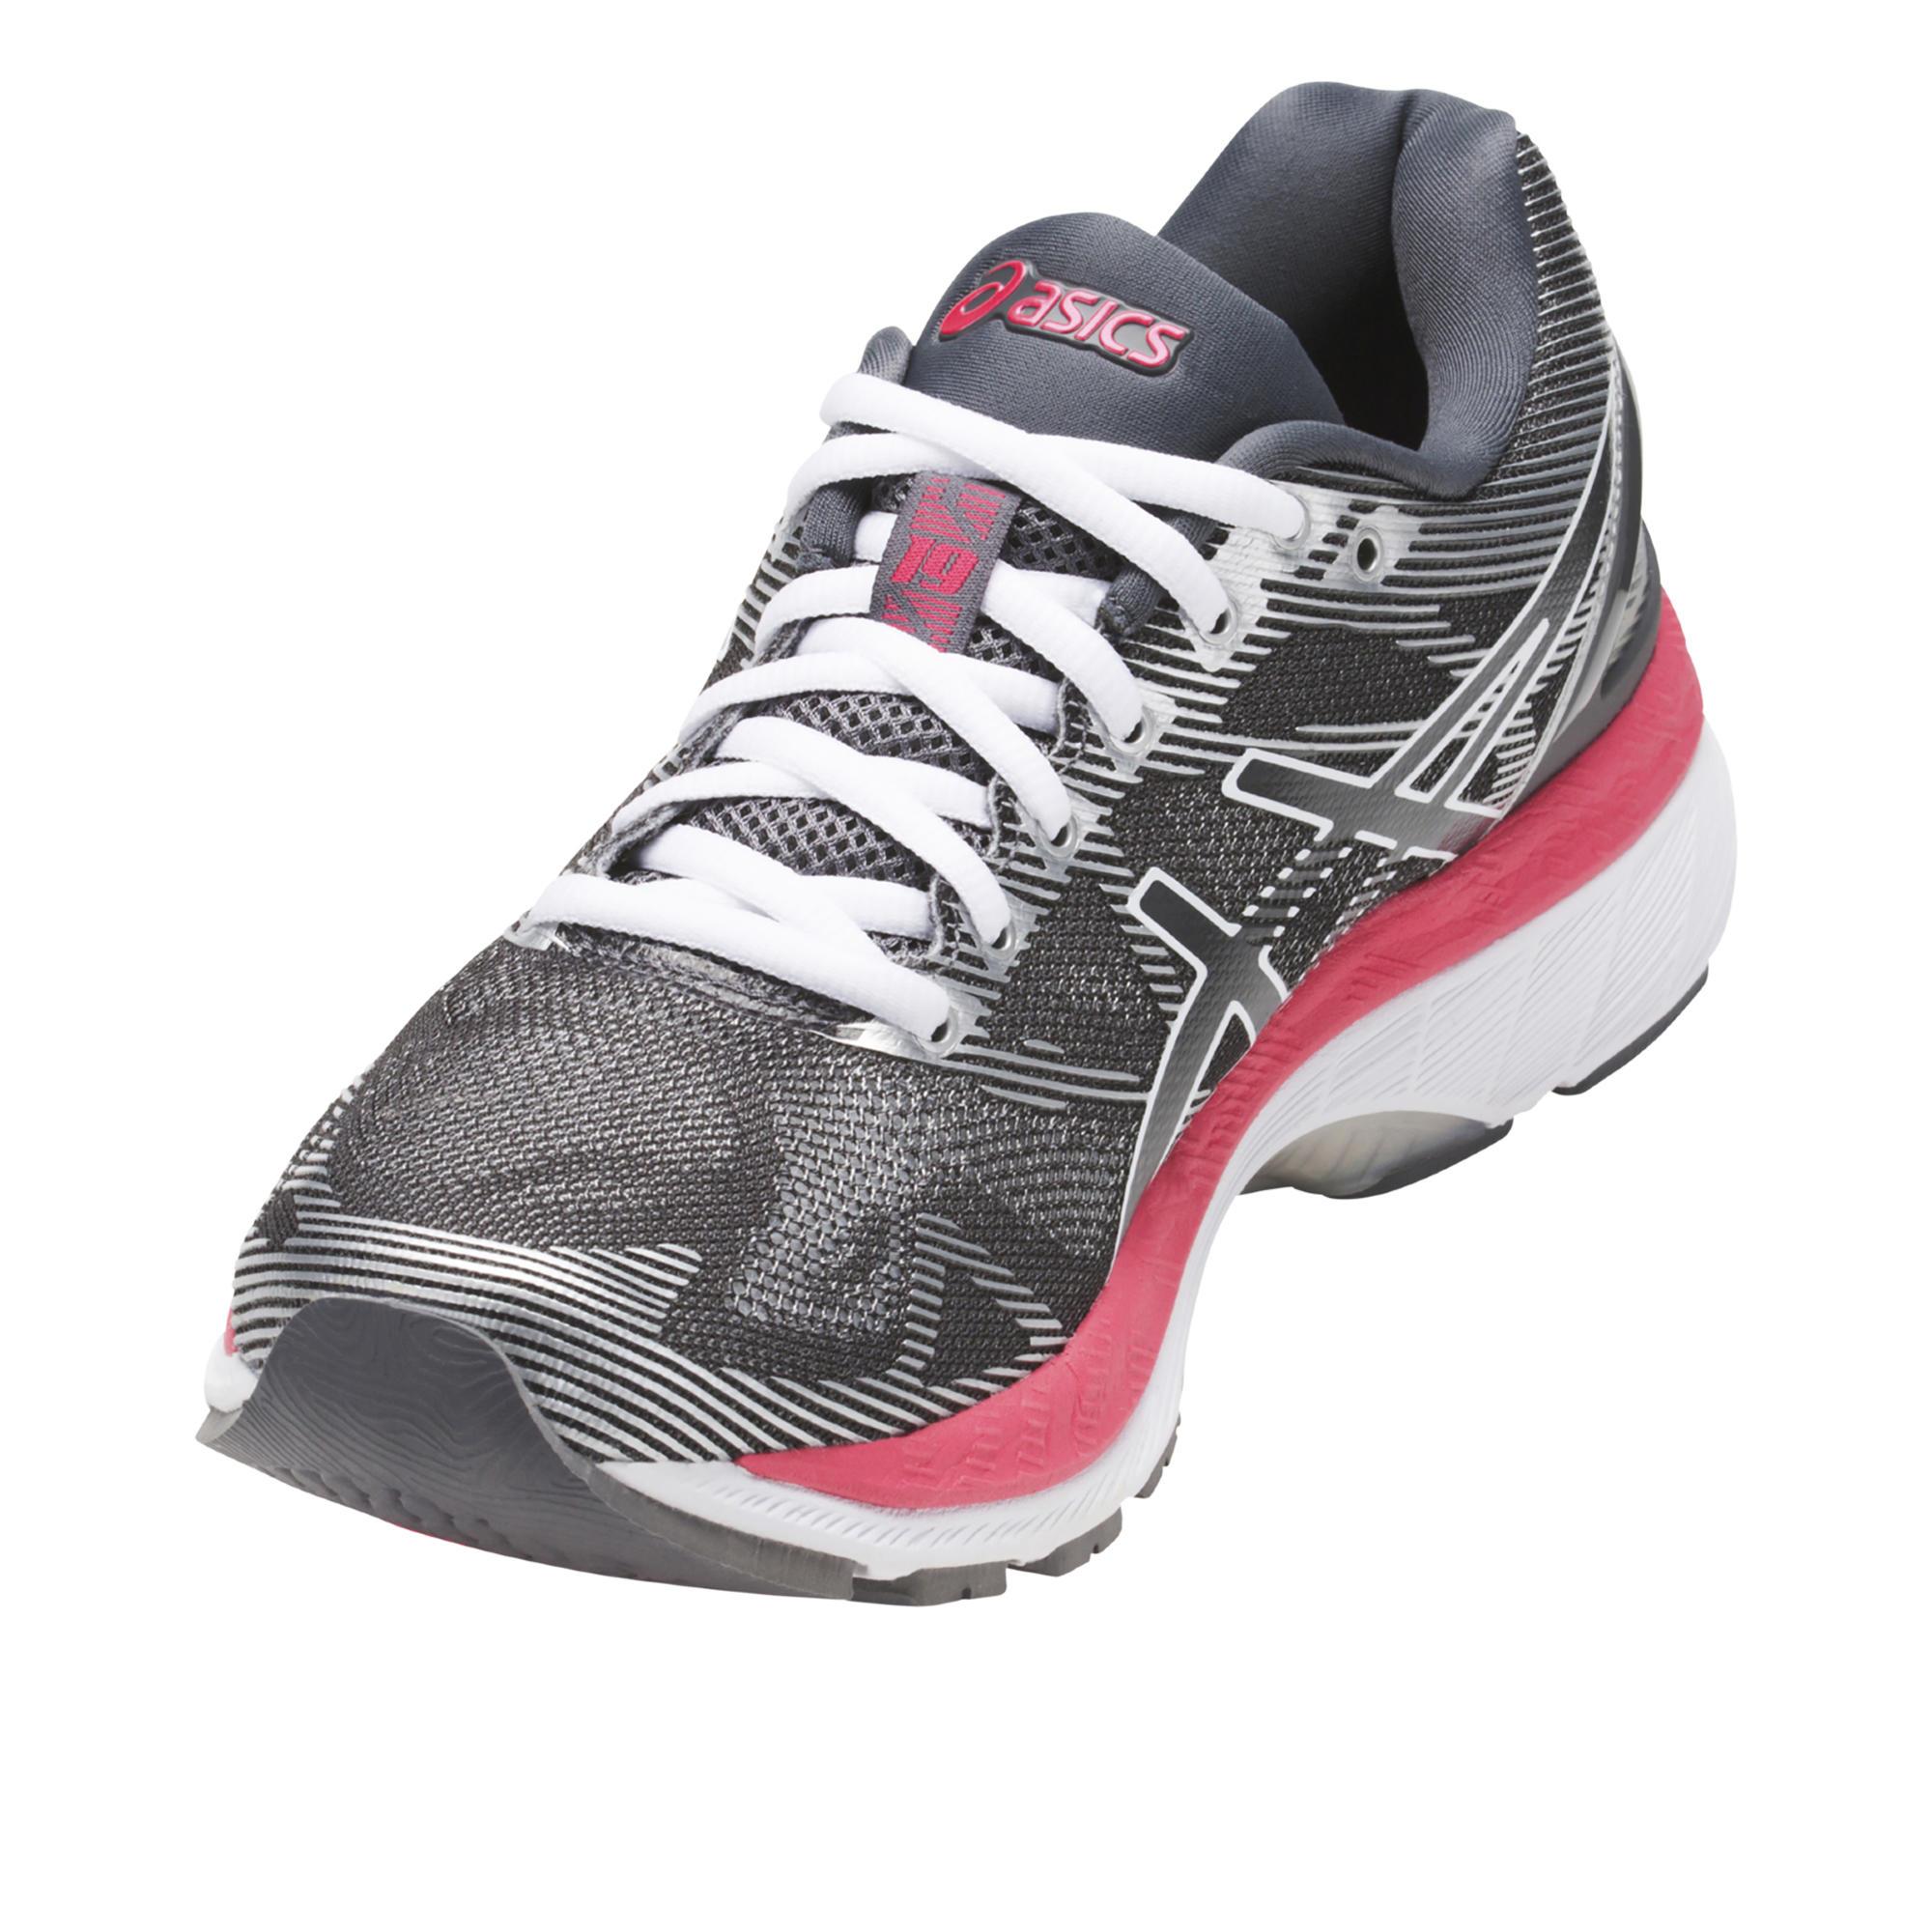 Running Femme Nimbus 19 Gris Gel Asics Chaussures dxBeoC